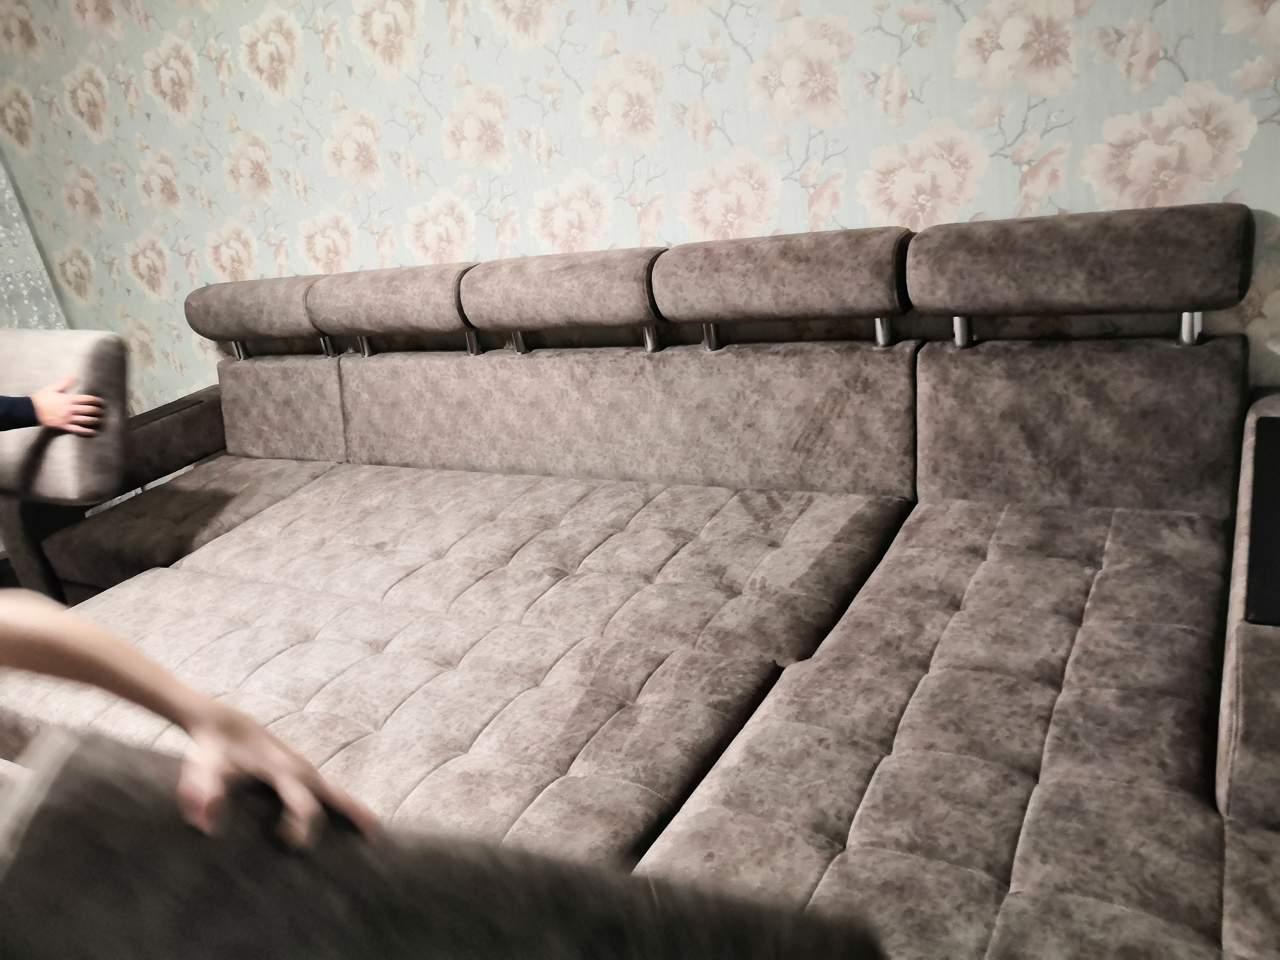 Перетяжка дивана с оттоманкой Казань